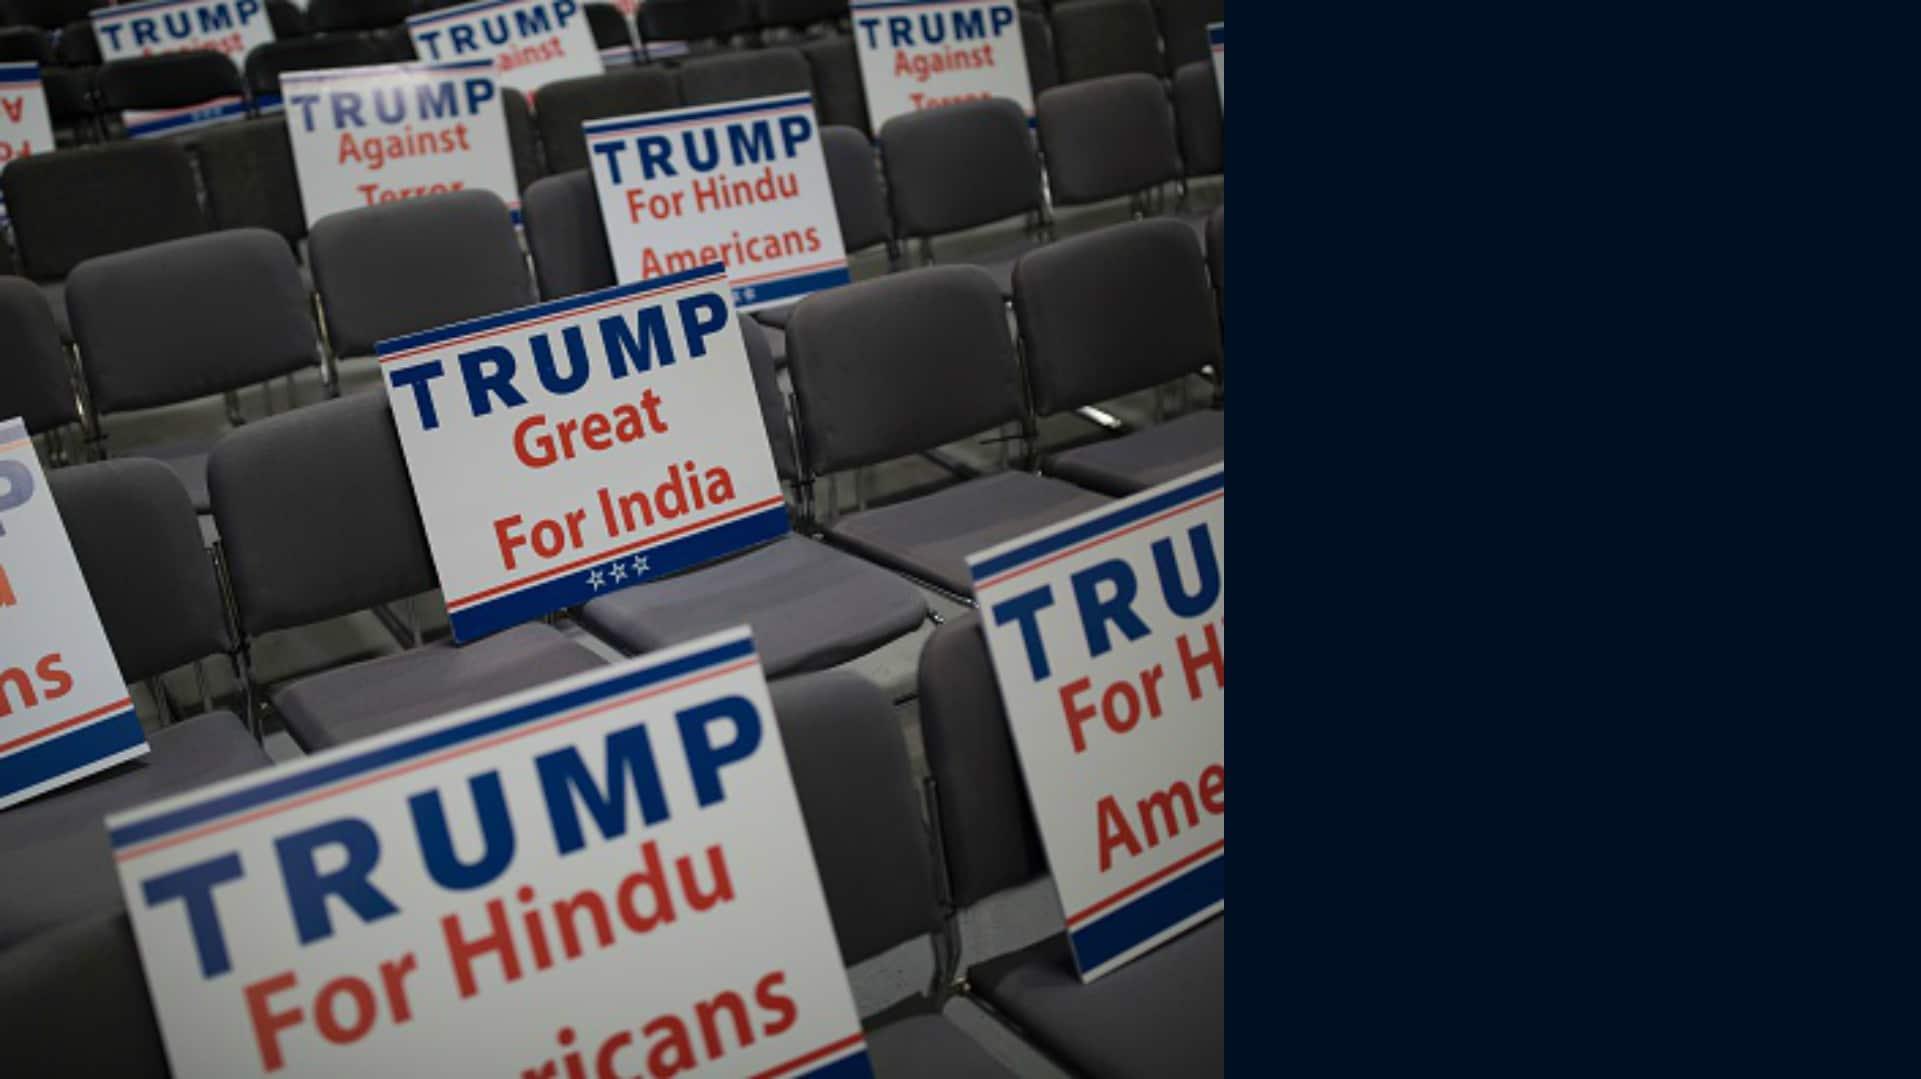 Republican Hindu Coalition: A misguided idea of community